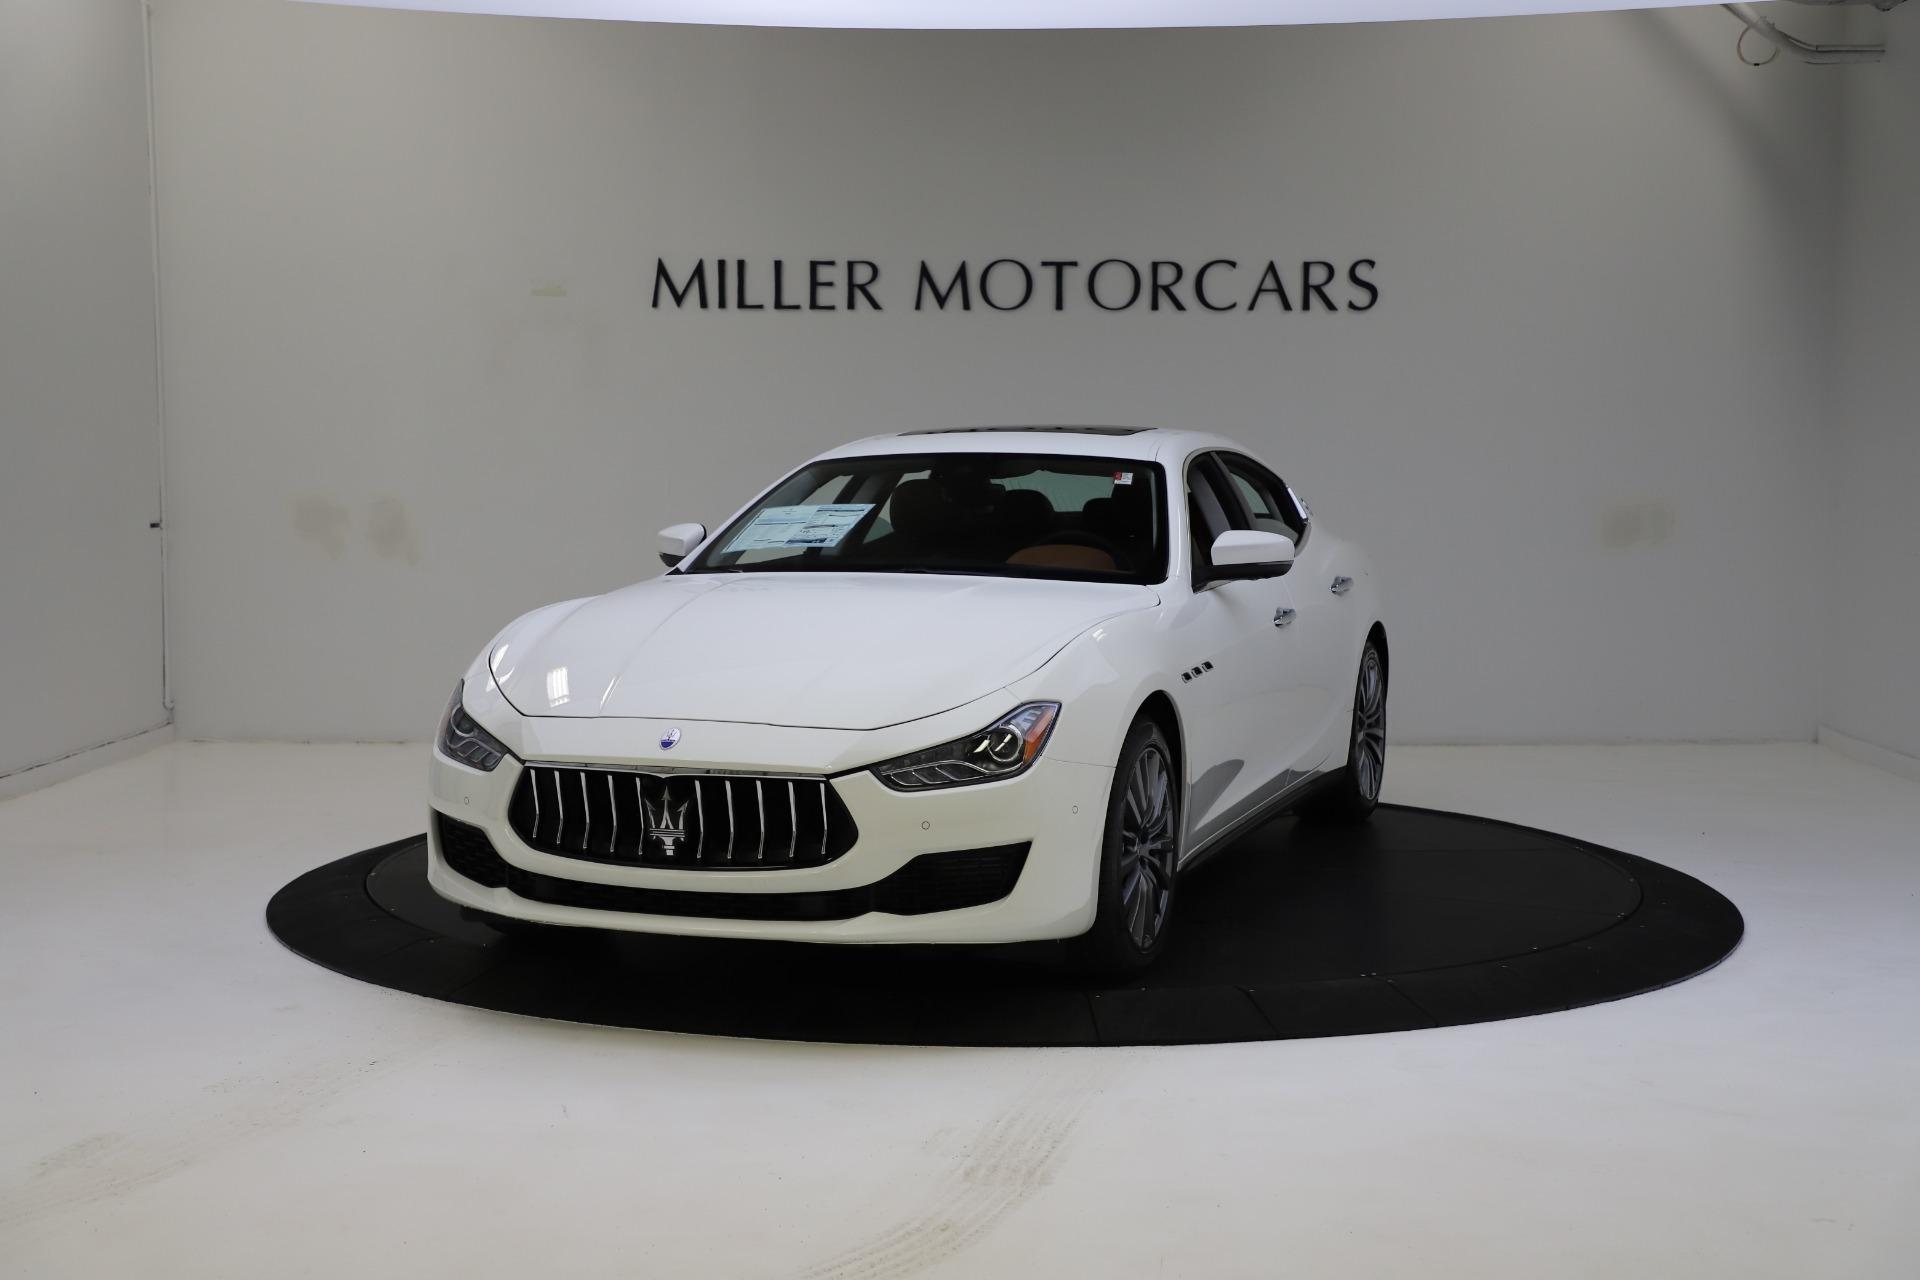 New 2021 Maserati Ghibli S Q4 for sale $85,754 at Rolls-Royce Motor Cars Greenwich in Greenwich CT 06830 1